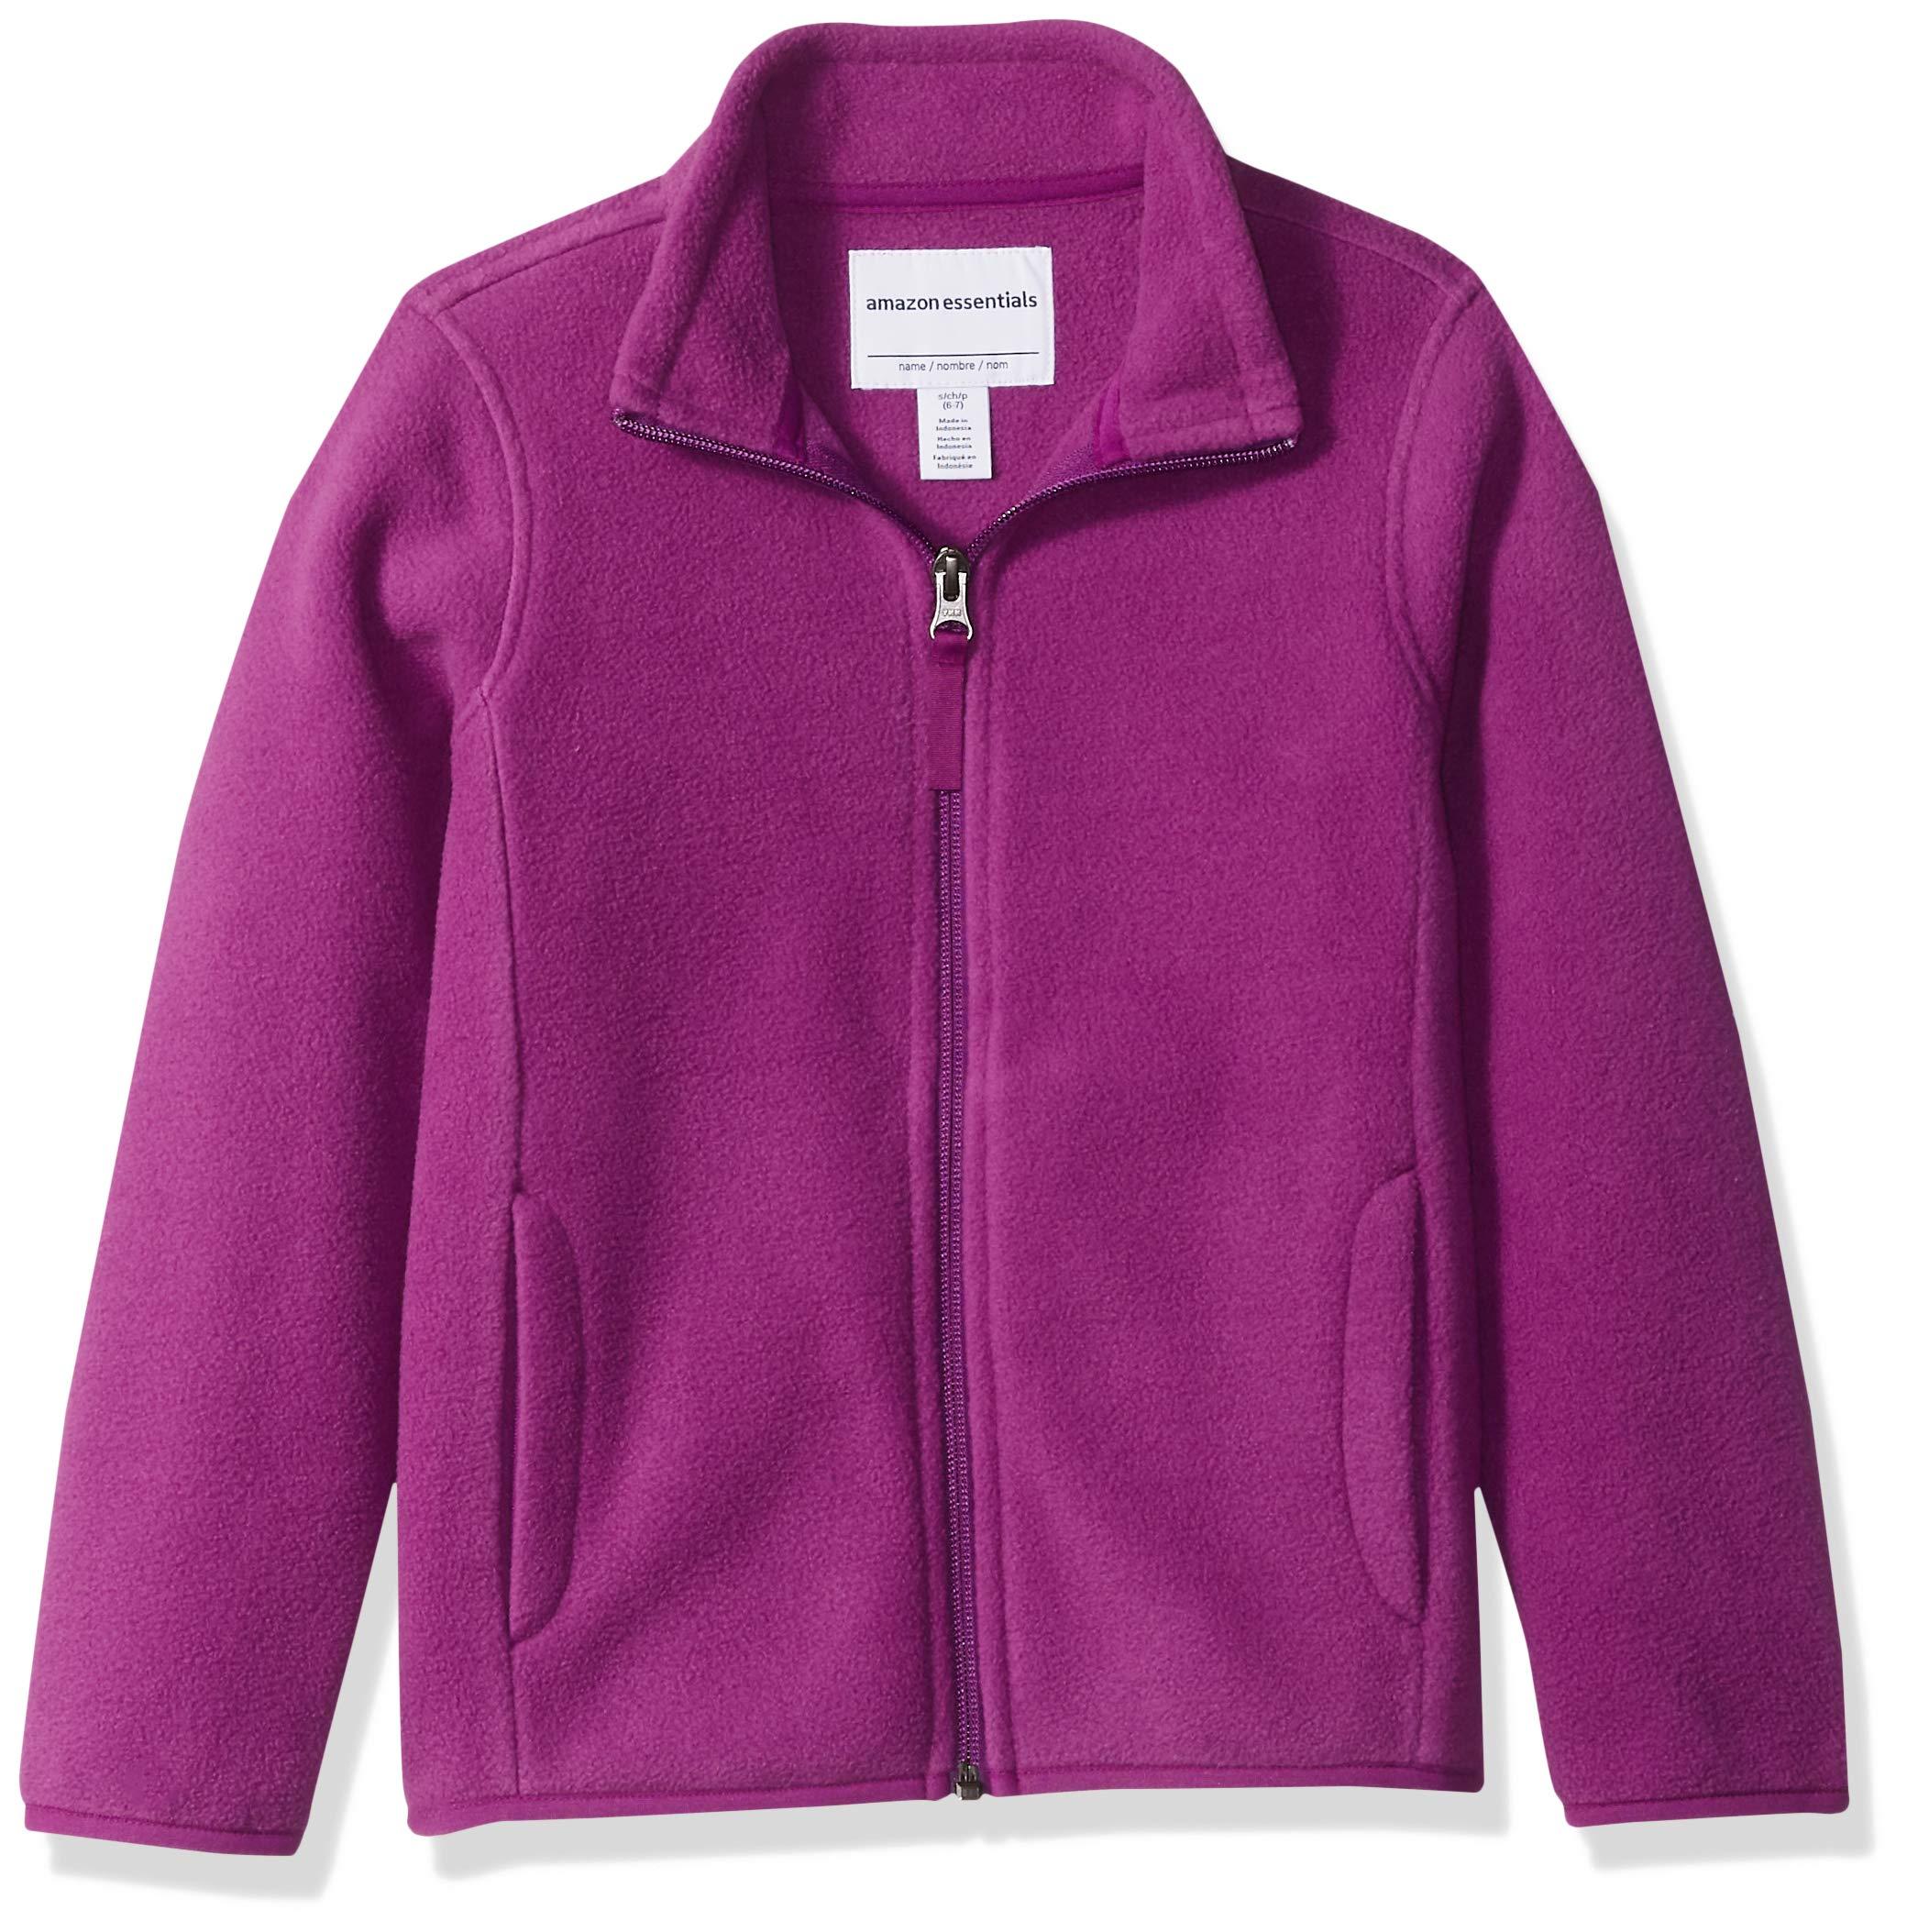 Amazon Essentials Girl's Full-Zip Polar Fleece Jacket, Plum Purple, XX-Large by Amazon Essentials